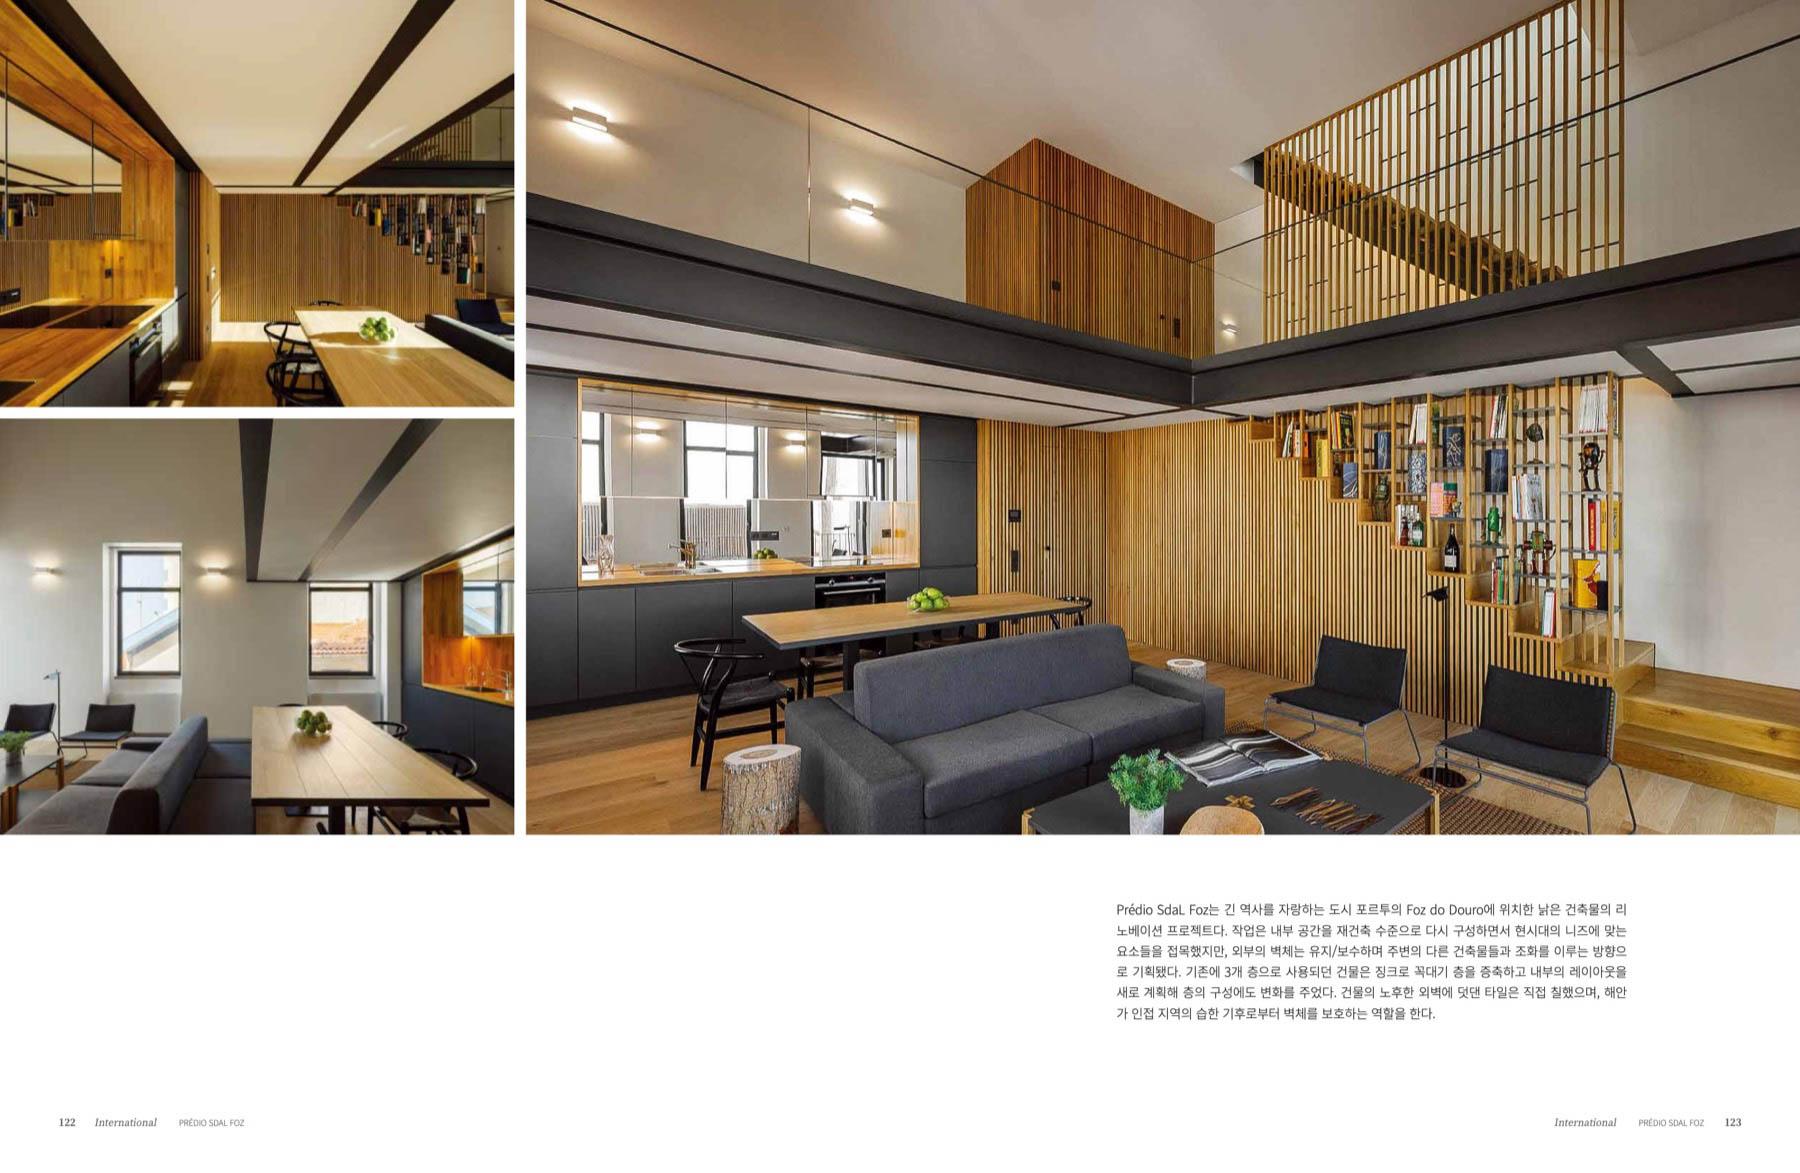 Deco Journal 310 Andres Stebelski Arquitecto 11 11